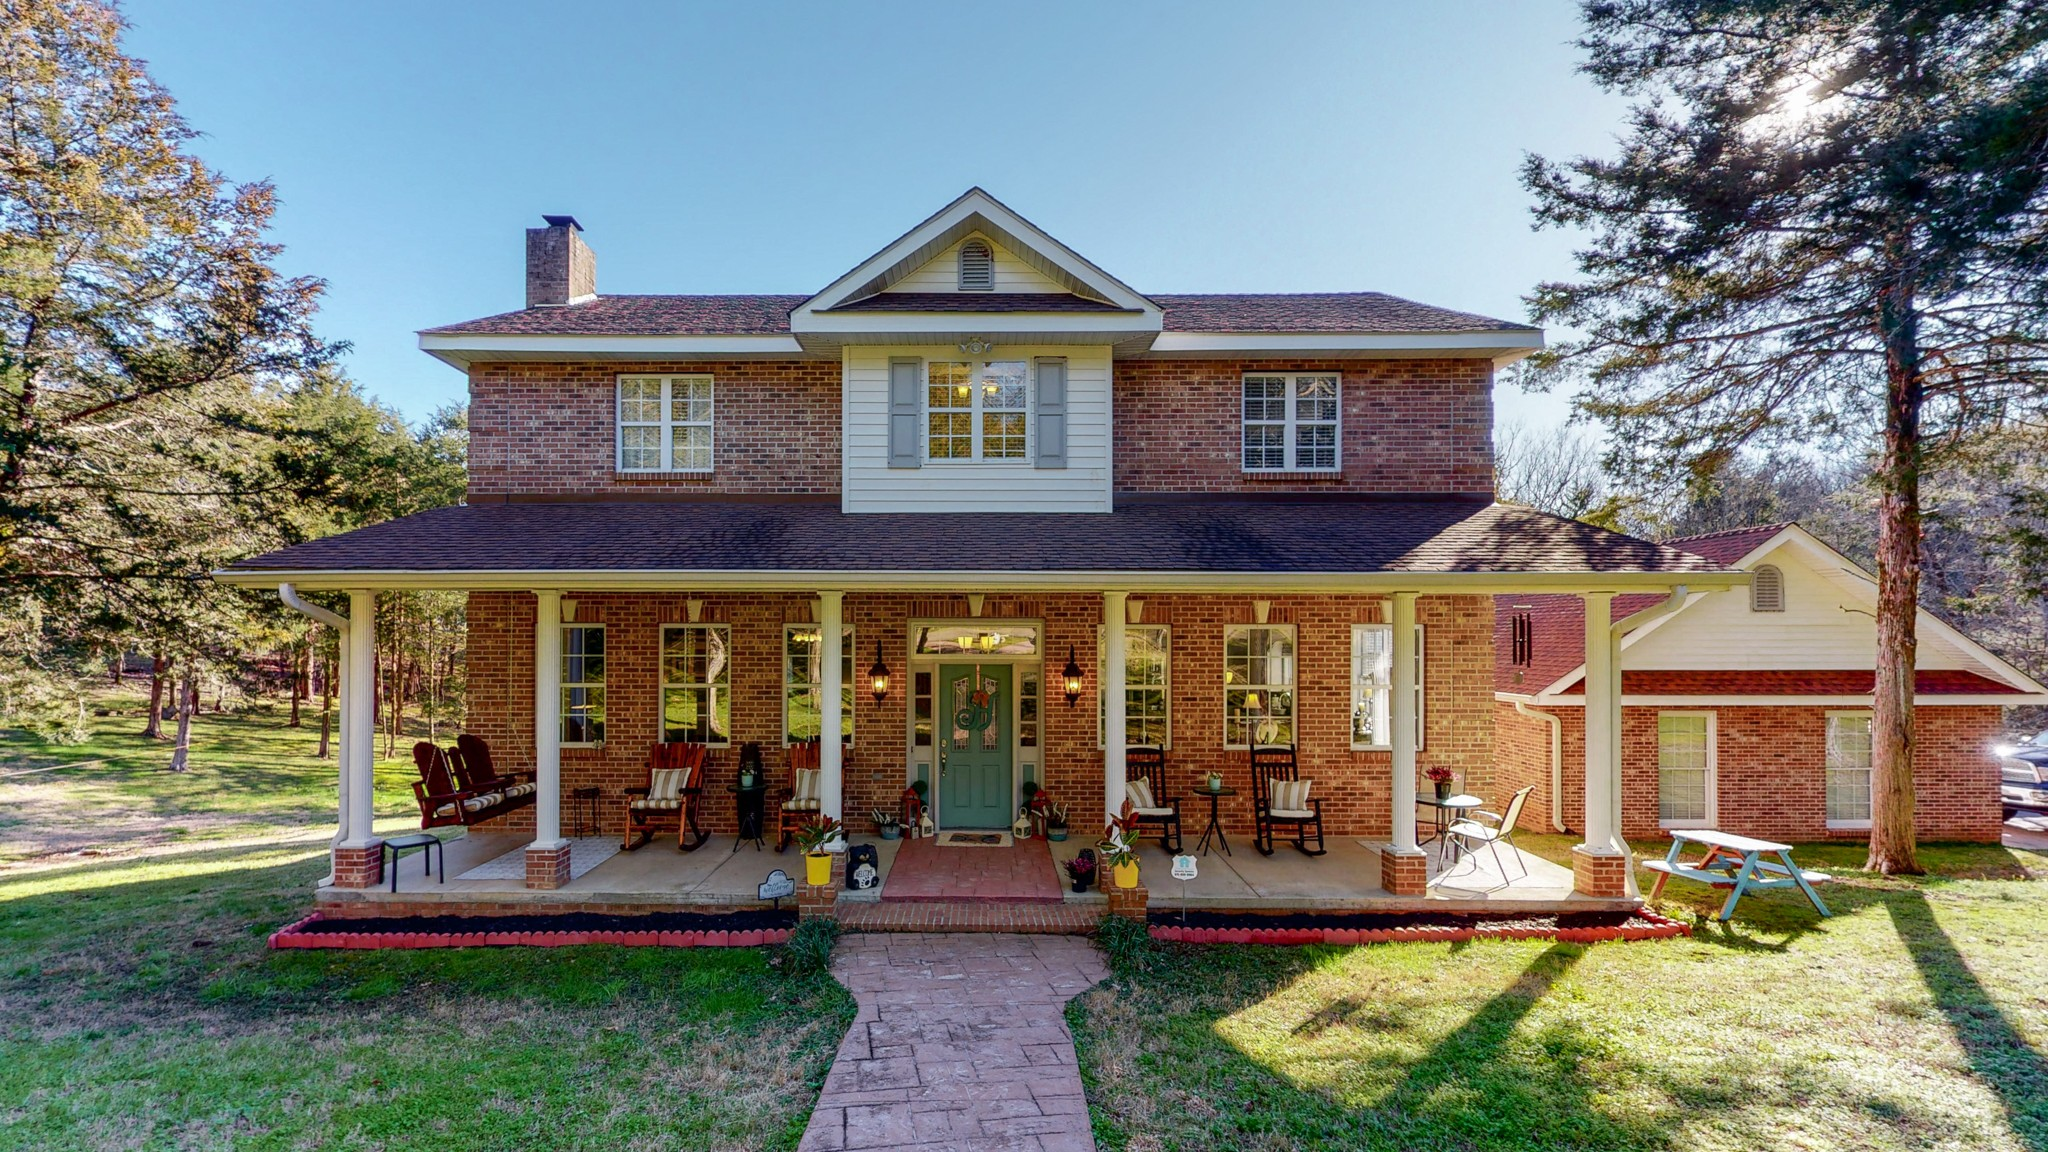 1965 Braly Ln, Pulaski, TN 38478 - Pulaski, TN real estate listing